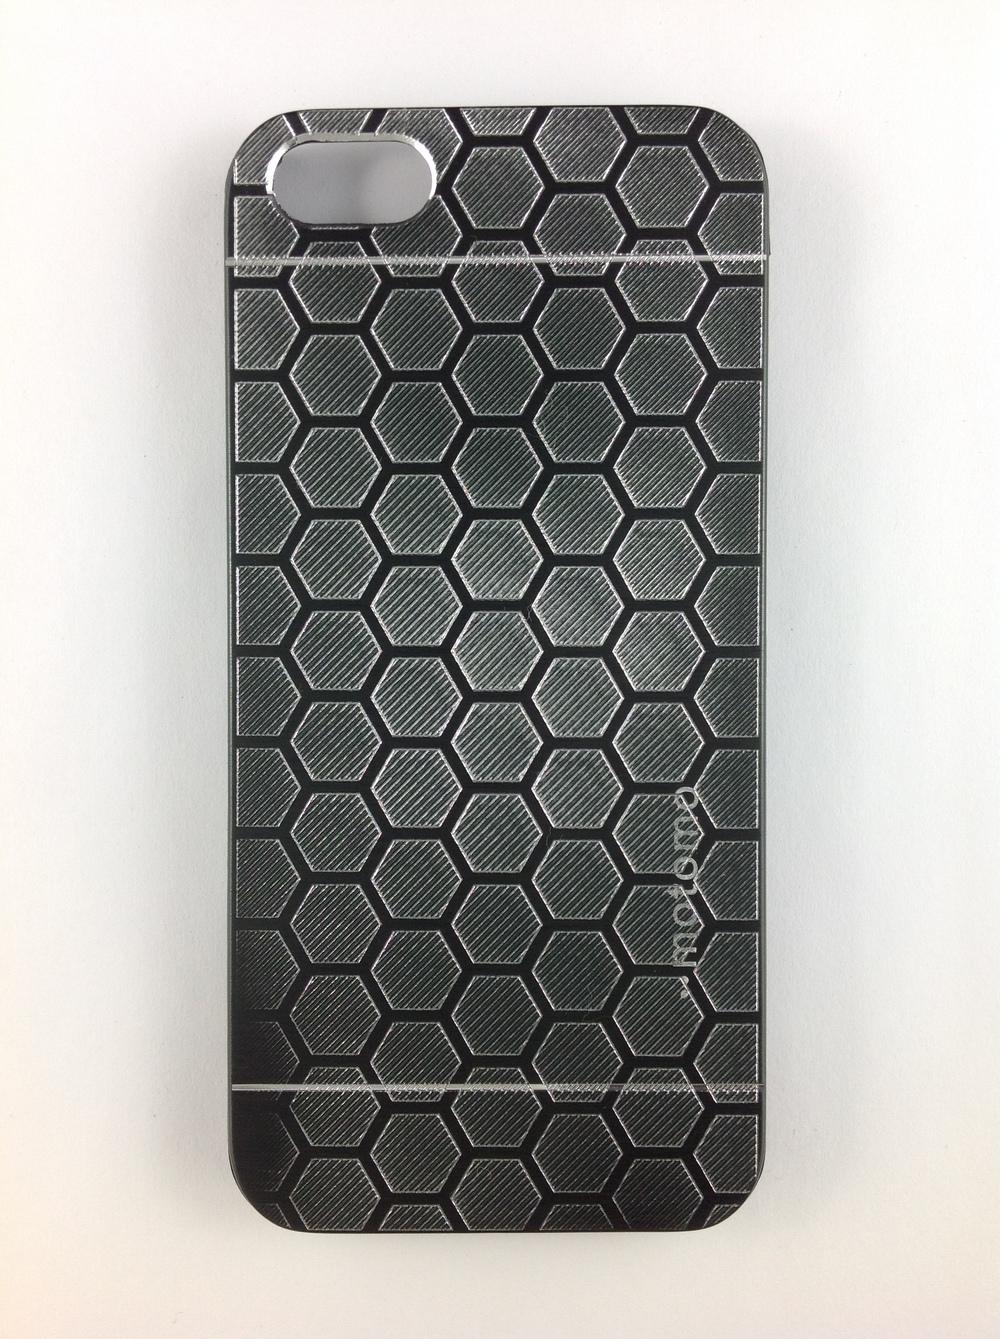 DigitalCarver-iPhone5s-IMG_3693.JPG